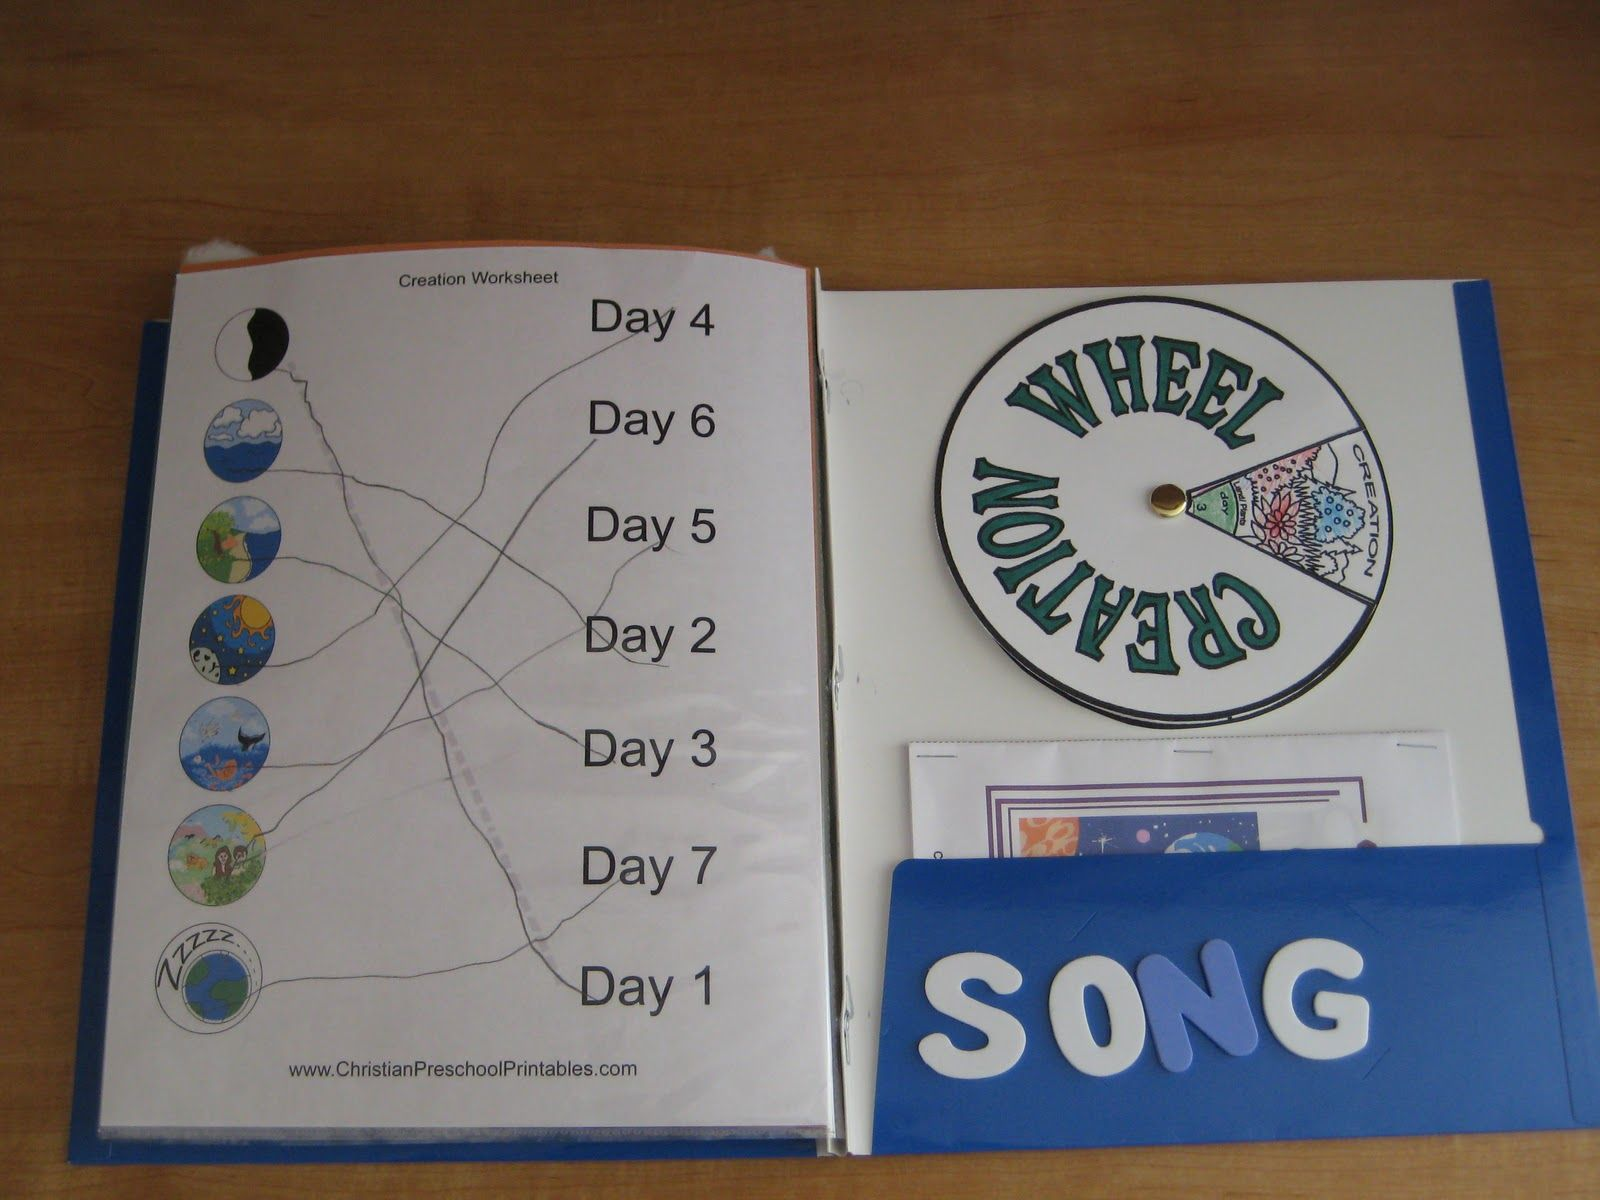 worksheet Creation Worksheets Ks2 7 days of creation crafts the worksheet we did and wheel made